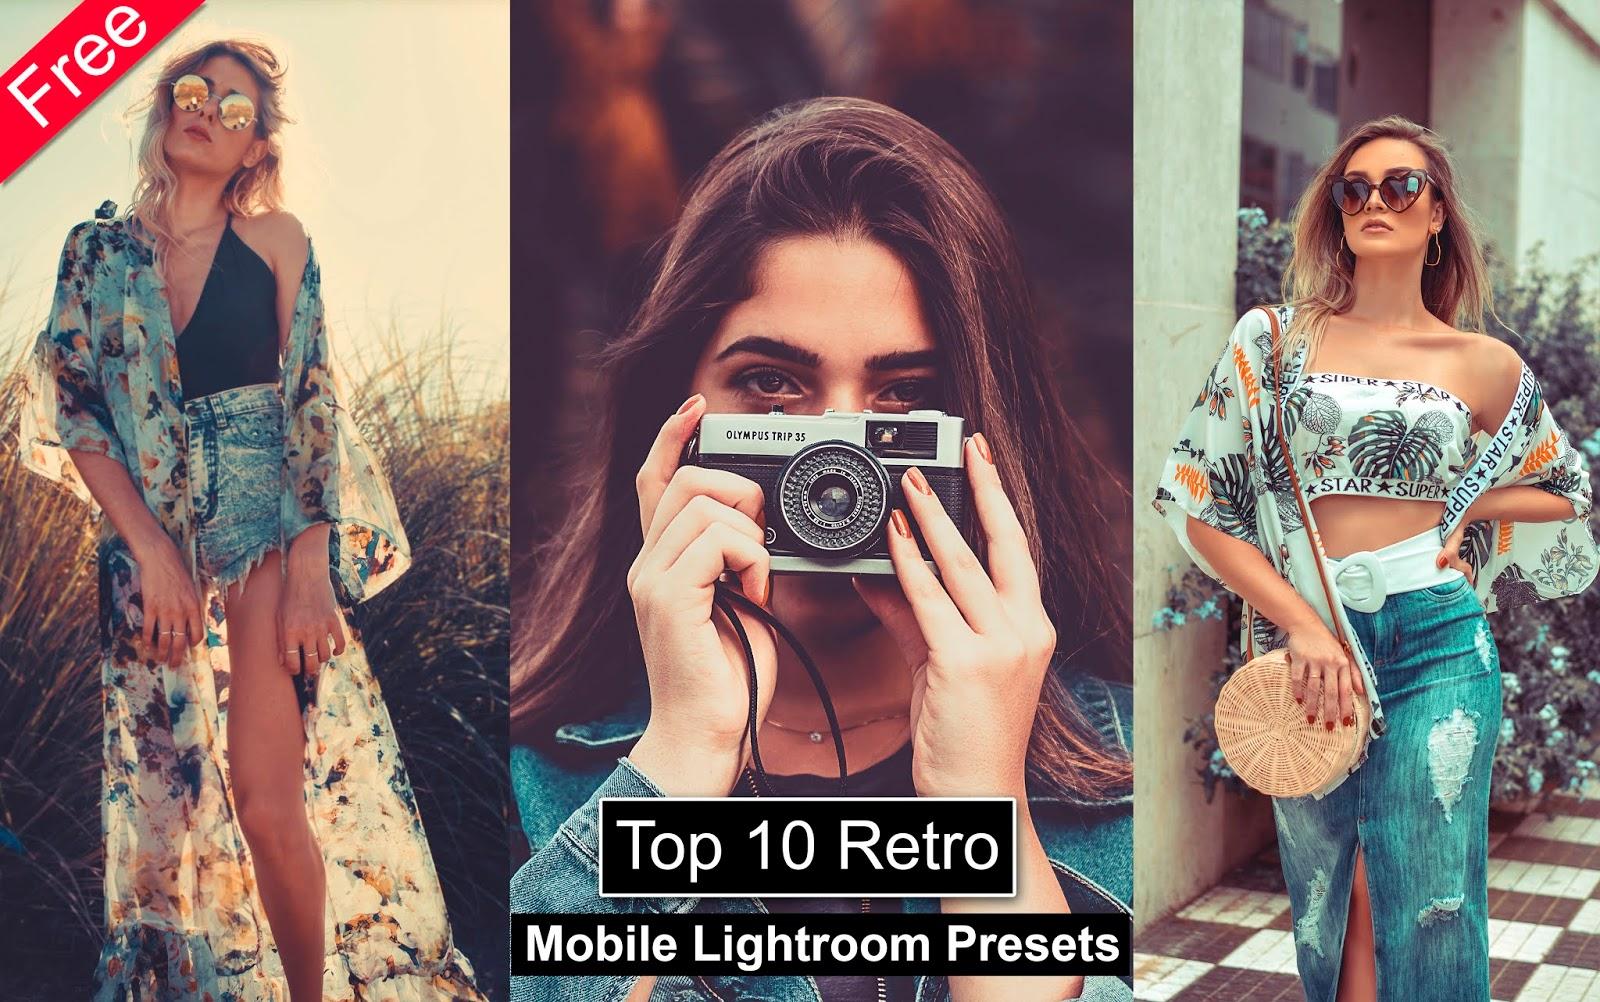 Download Top 10 Retro Mobile Lightroom Presets for Free | Top 10 Mobile Lightroom Presets of 2019